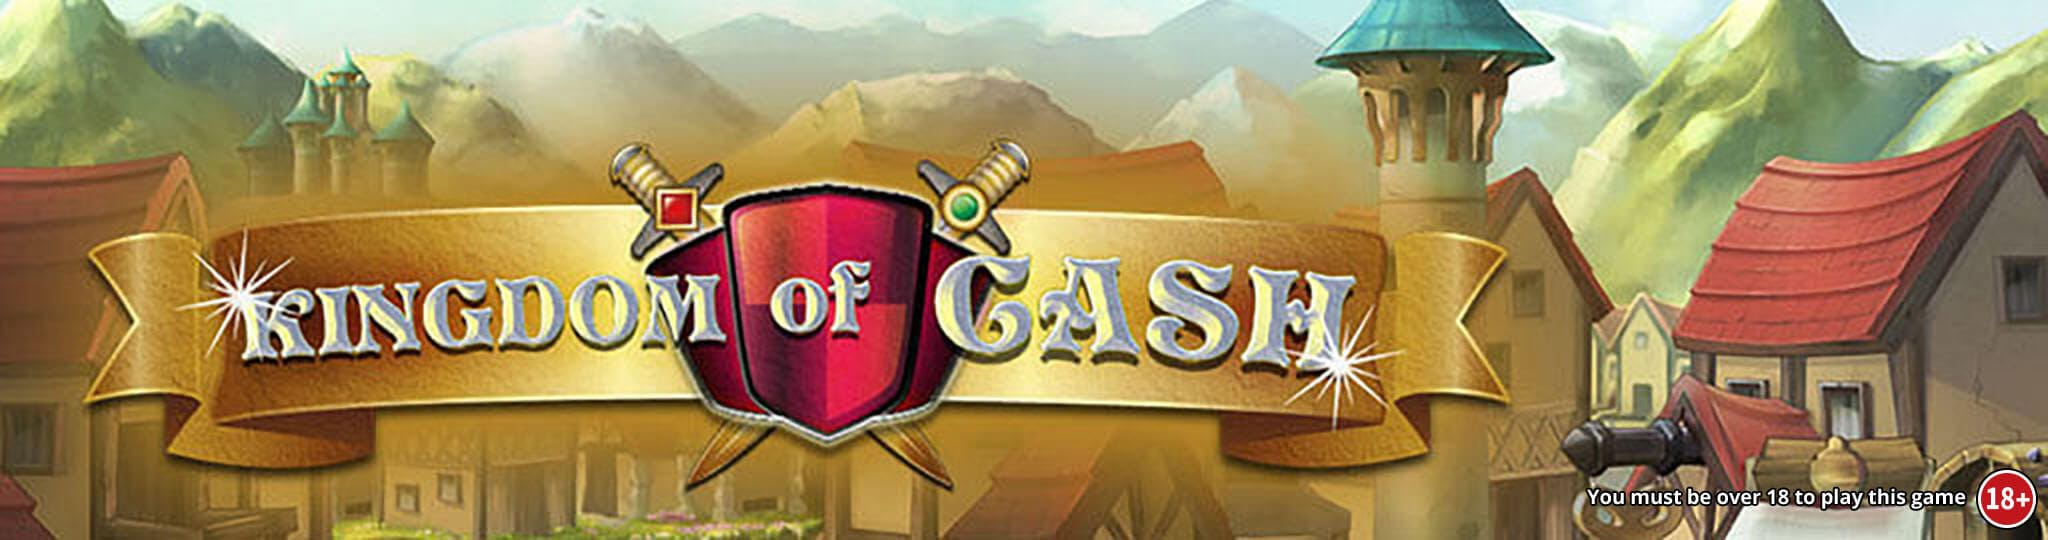 Kingdom of Cash Slot Review